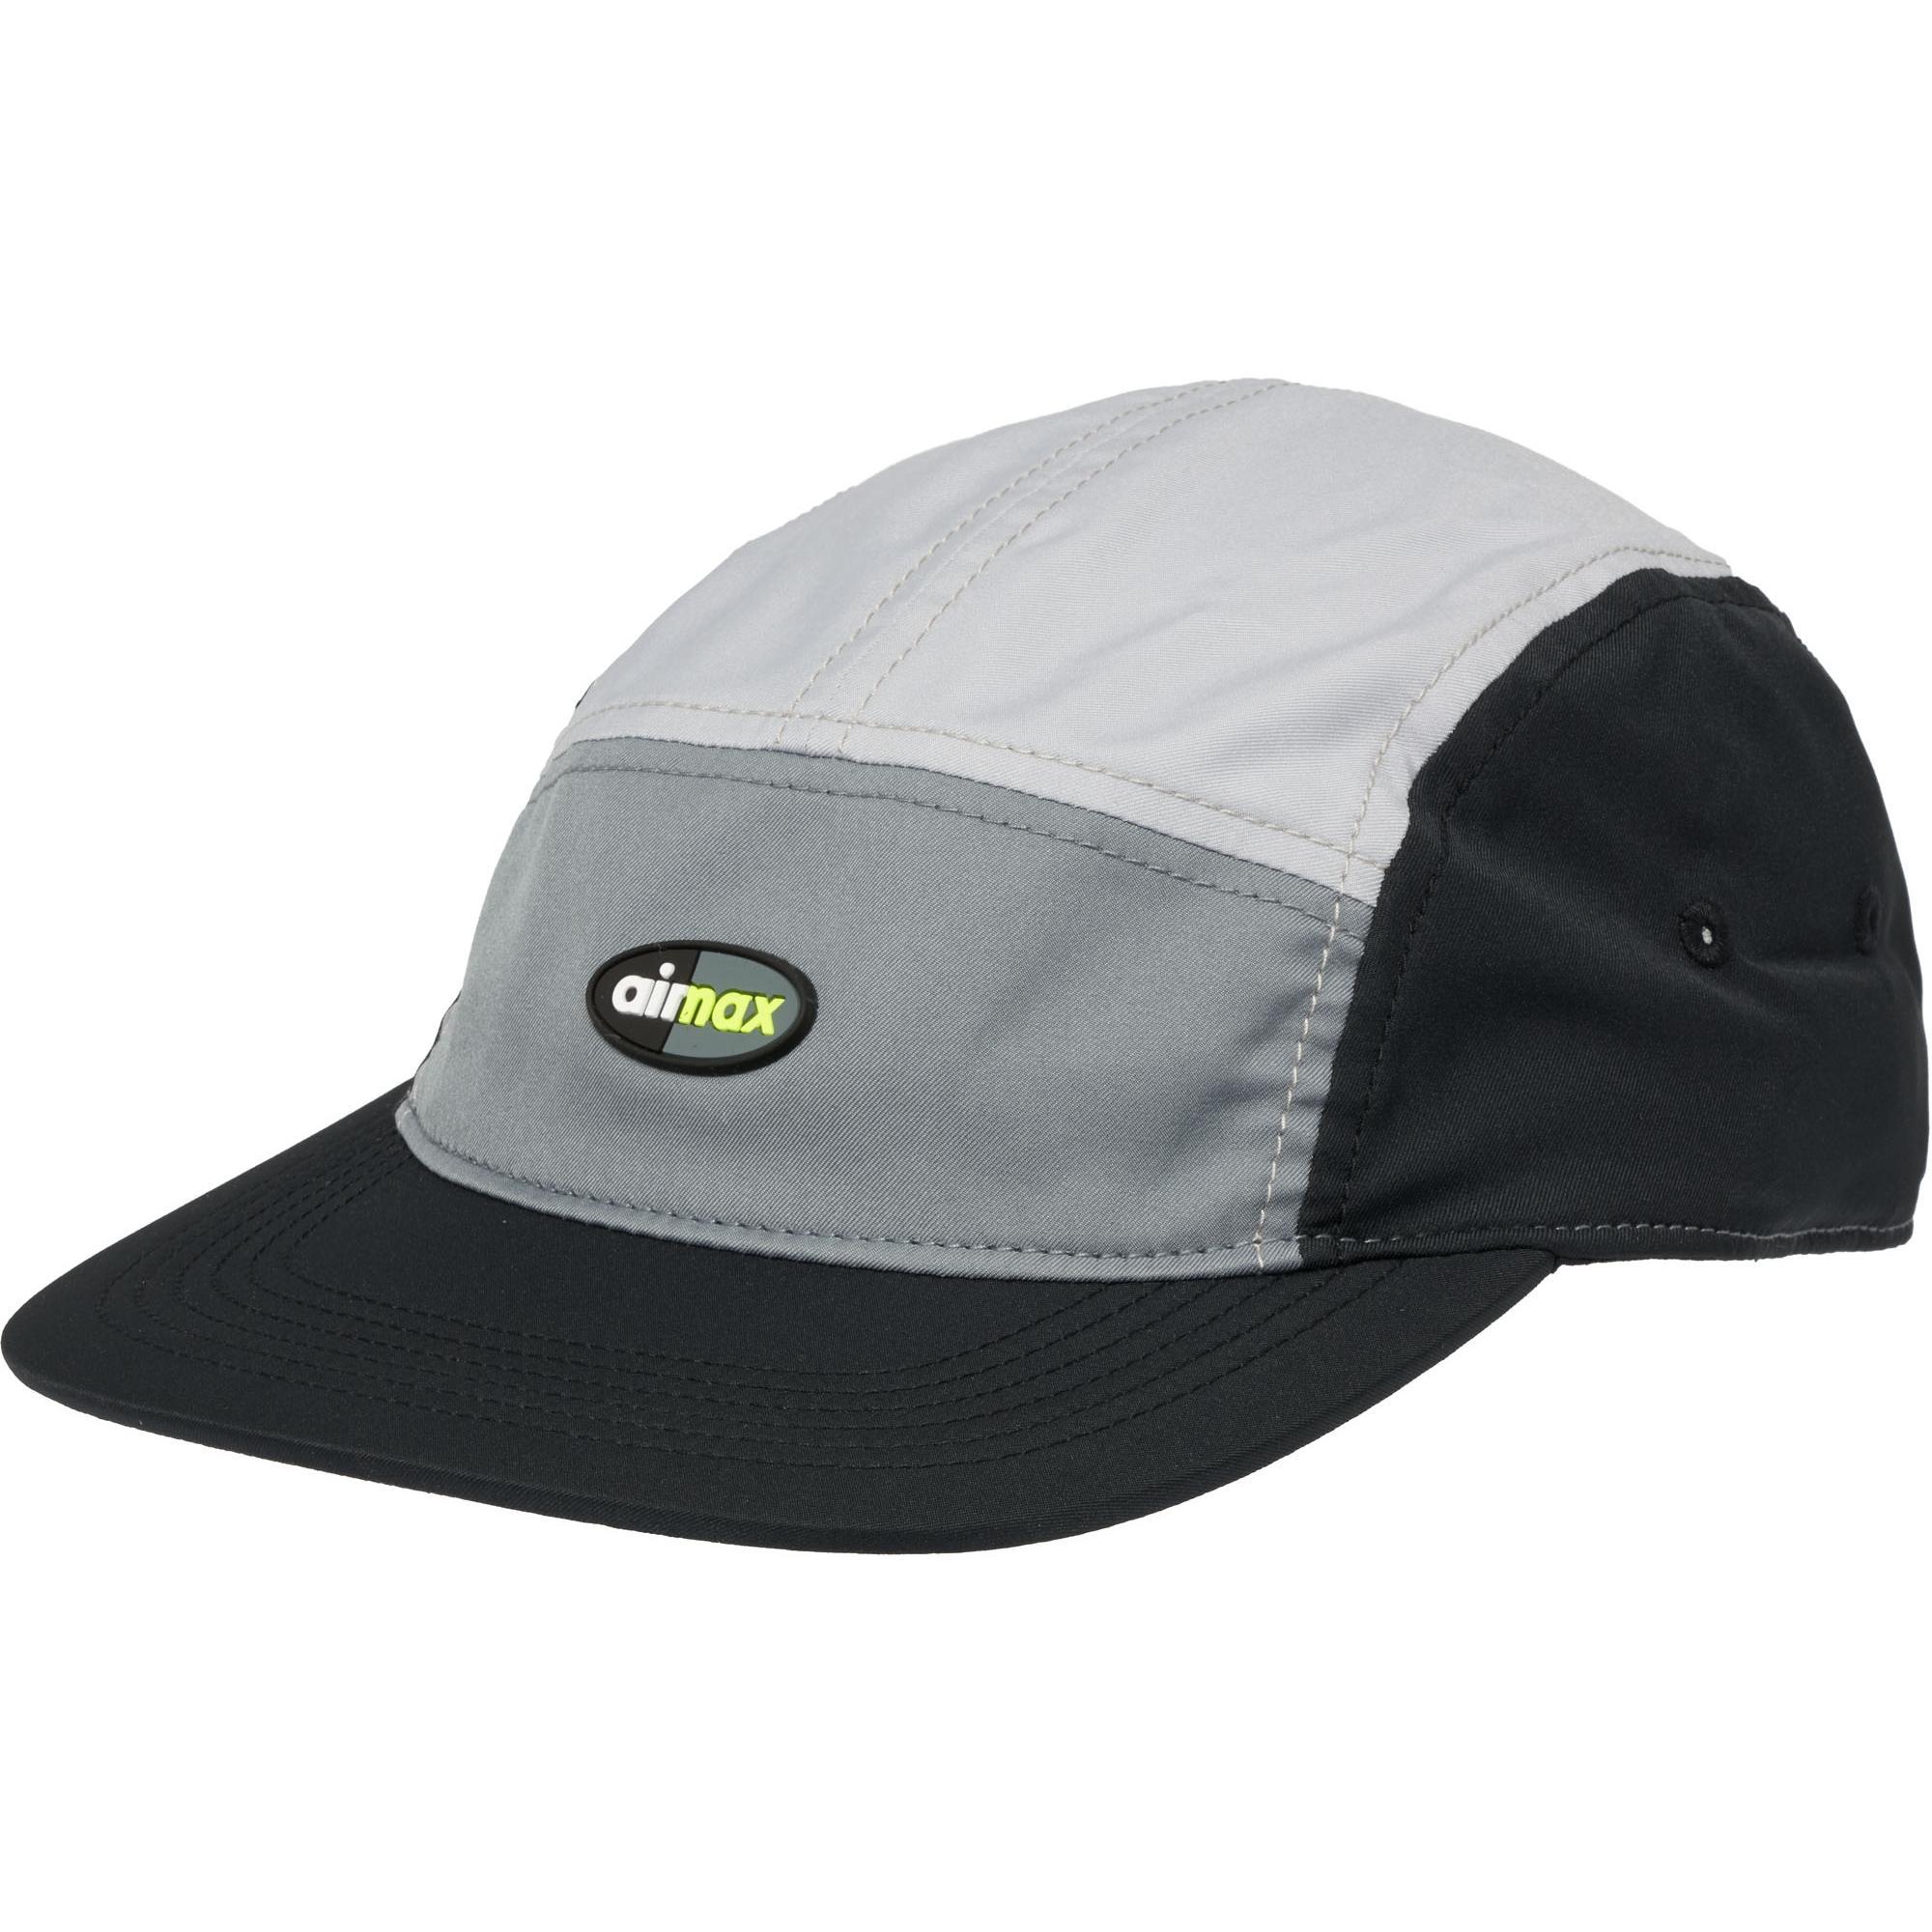 07052fcf ... usa lyst nike air max aw84 cap black grey in gray for men 02c94 ec121